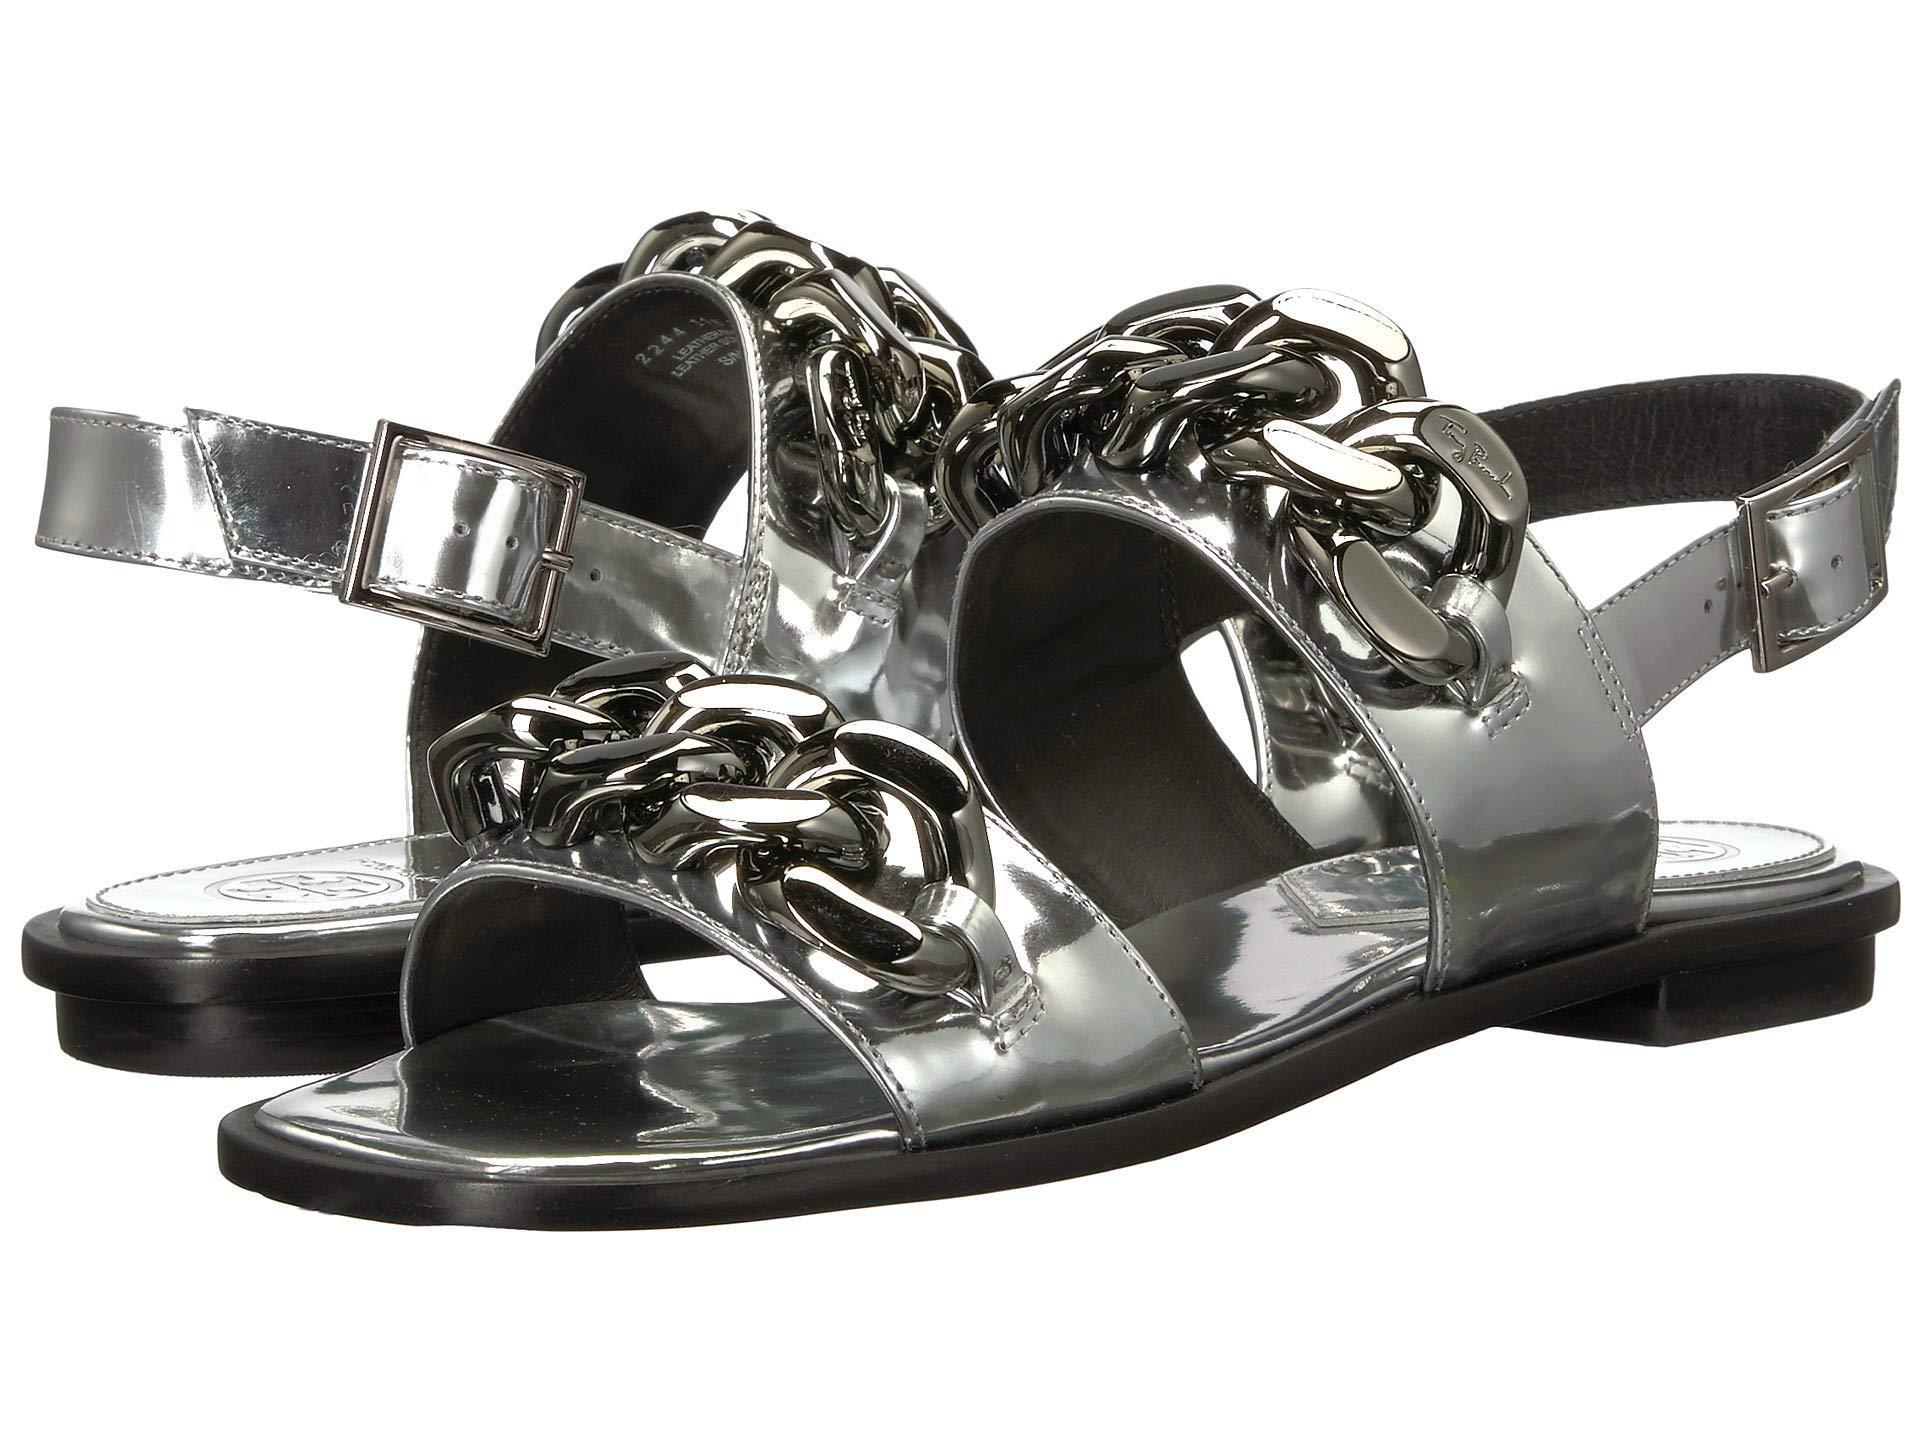 c5cae7c0260 Lyst - Tory Burch Adrien Sandal (silver) Women s Sandals in Metallic